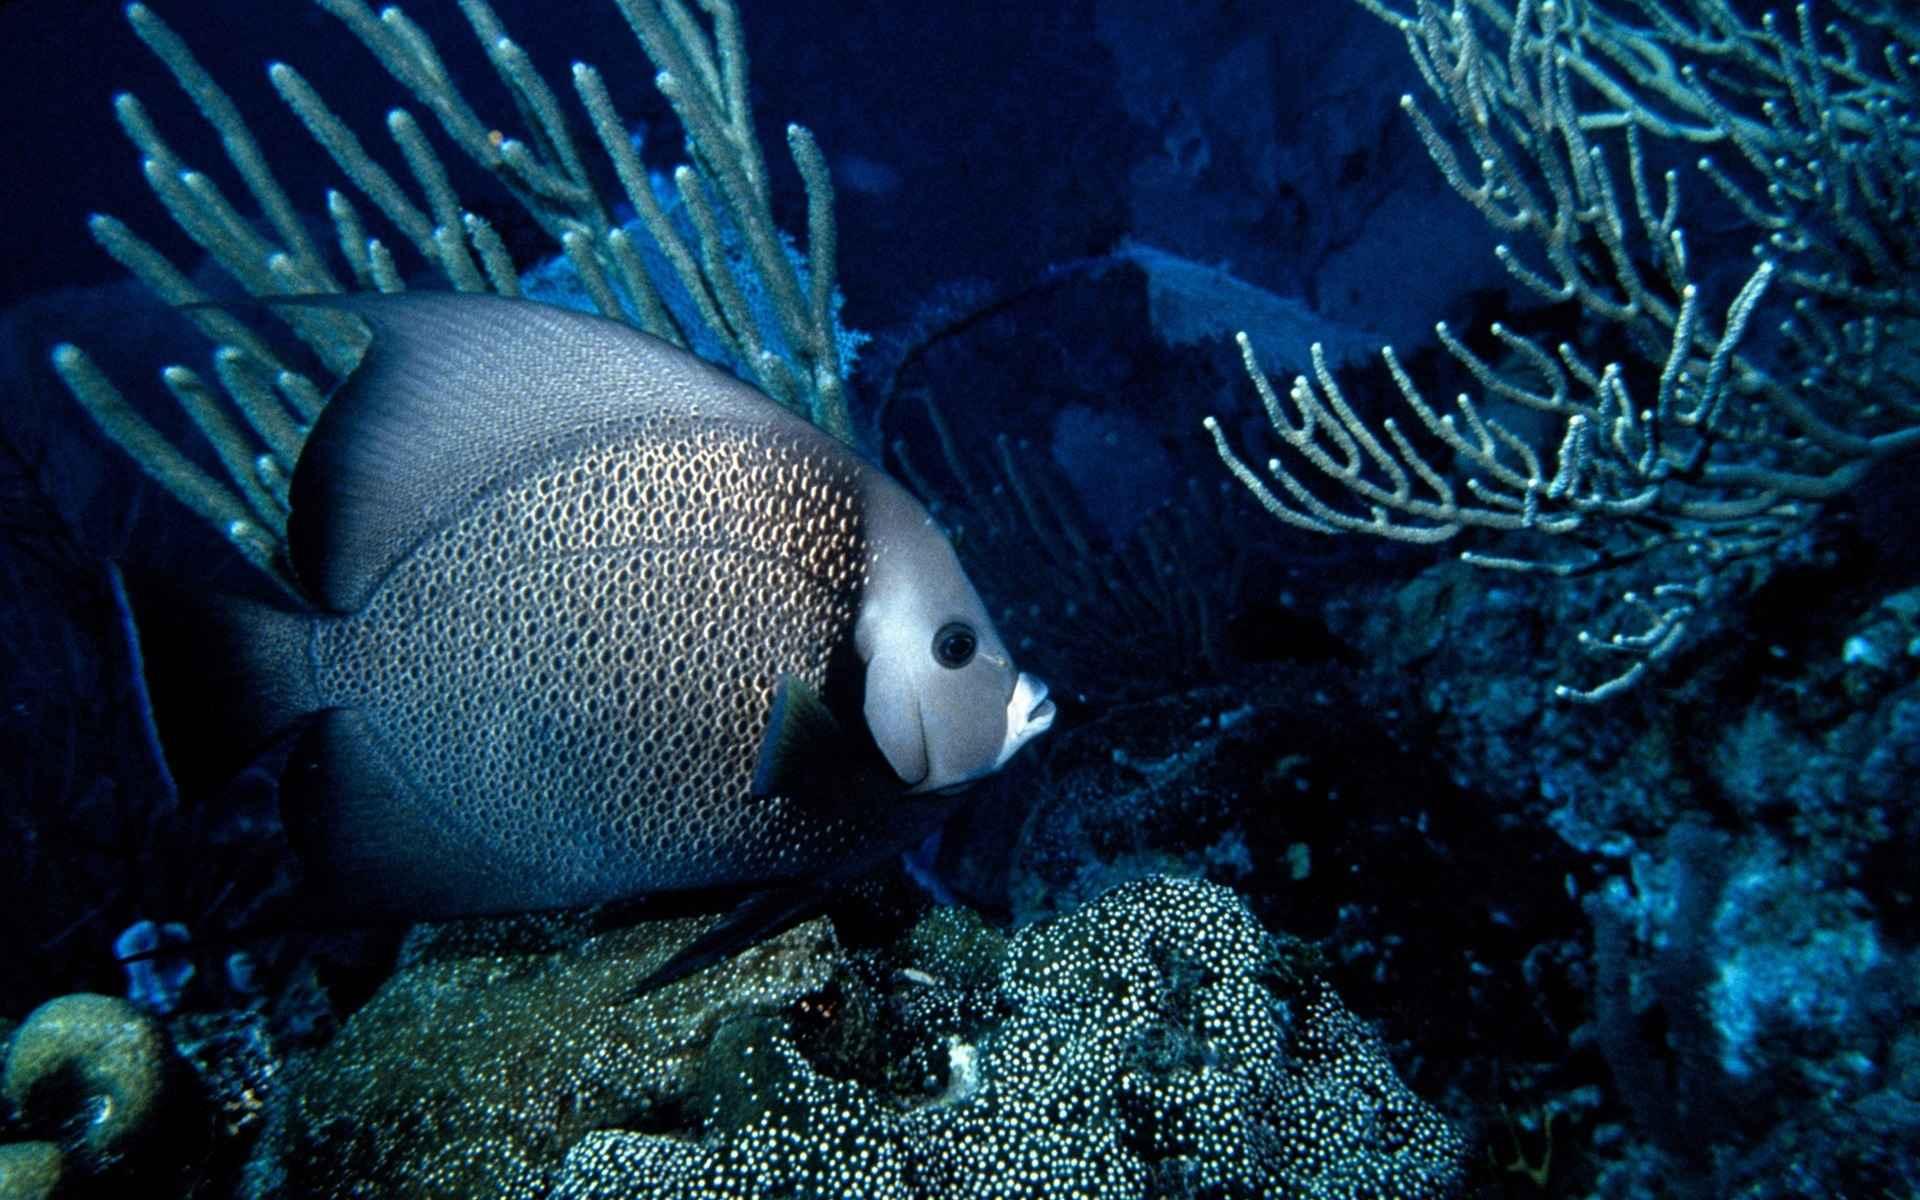 Fish Wallpaper 023